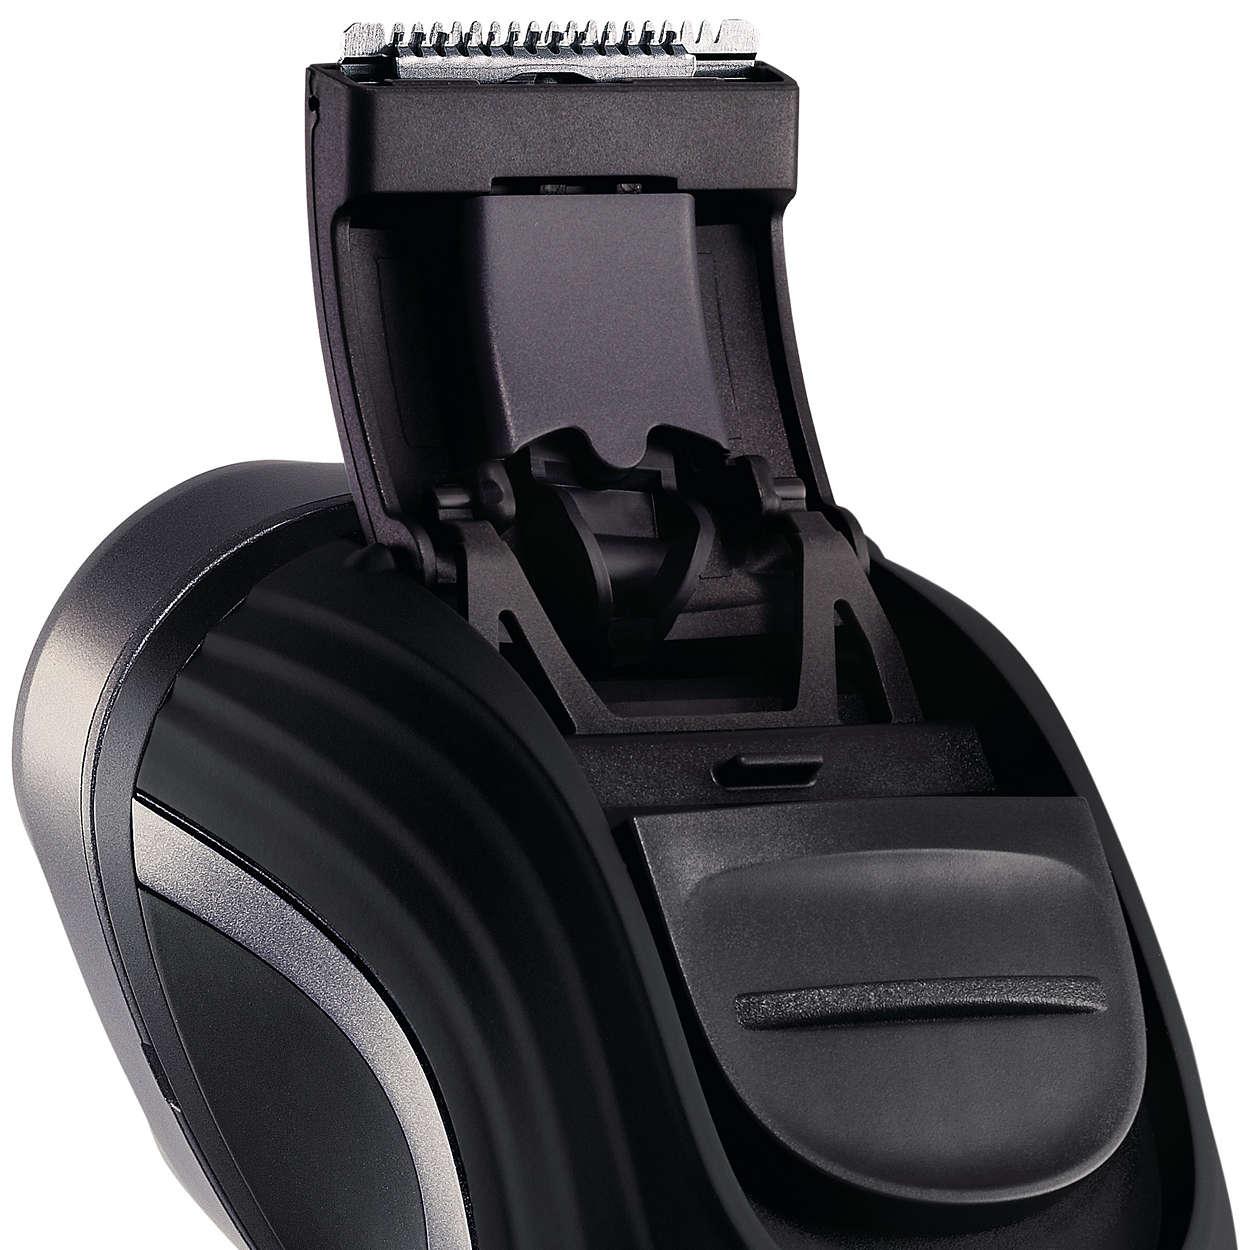 Shaver series 3000 Száraz elektromos borotva HQ6946 16  f3387be719